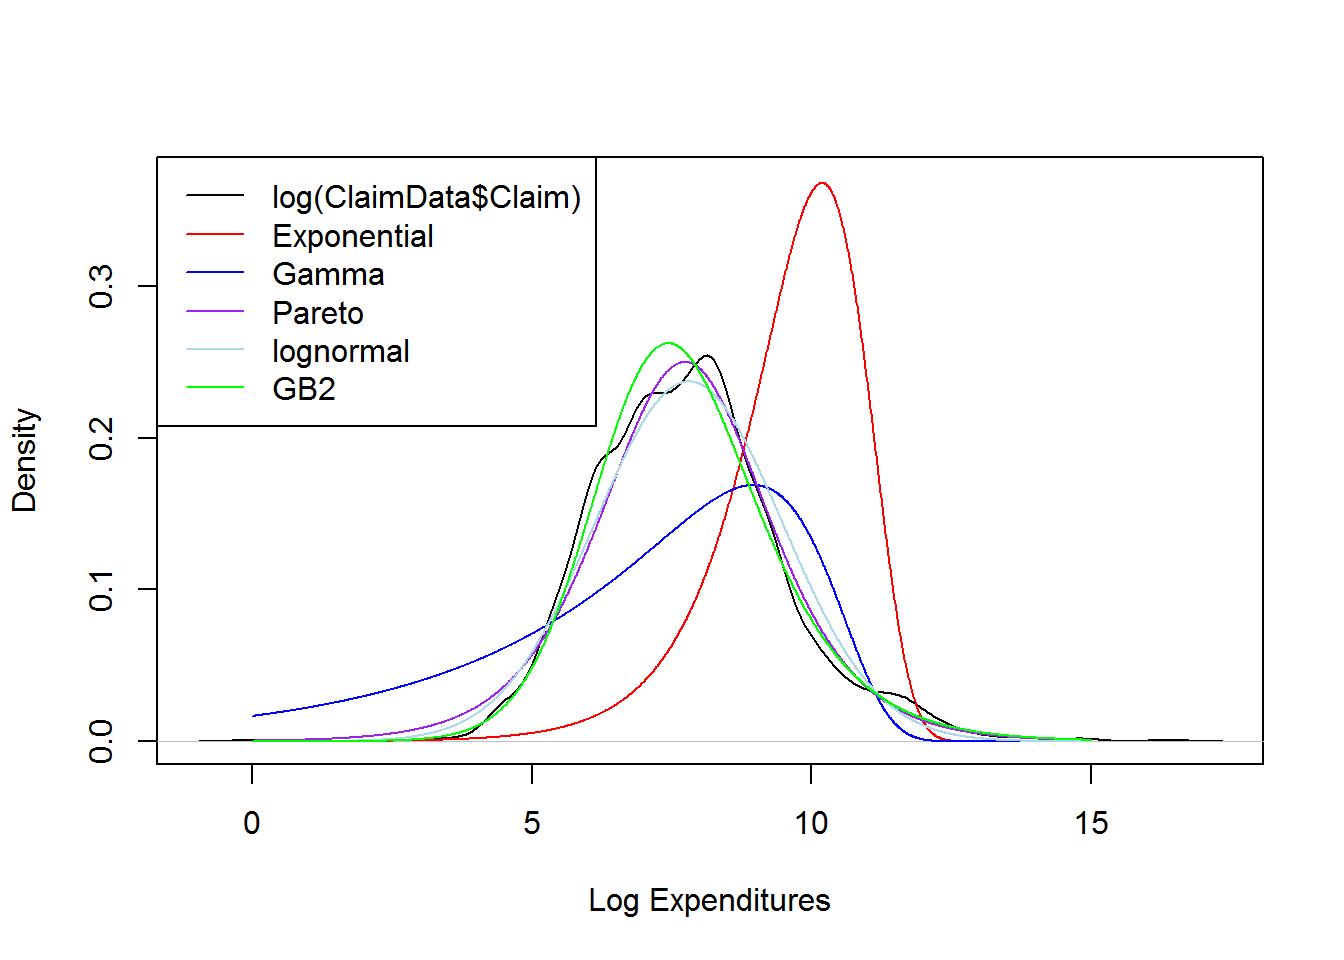 Loss data analytics r codes clogclaimdataclaimexponential gamma paretolognormalgb2 lty1 col cblackredbluepurplelightbluegreen publicscrutiny Choice Image